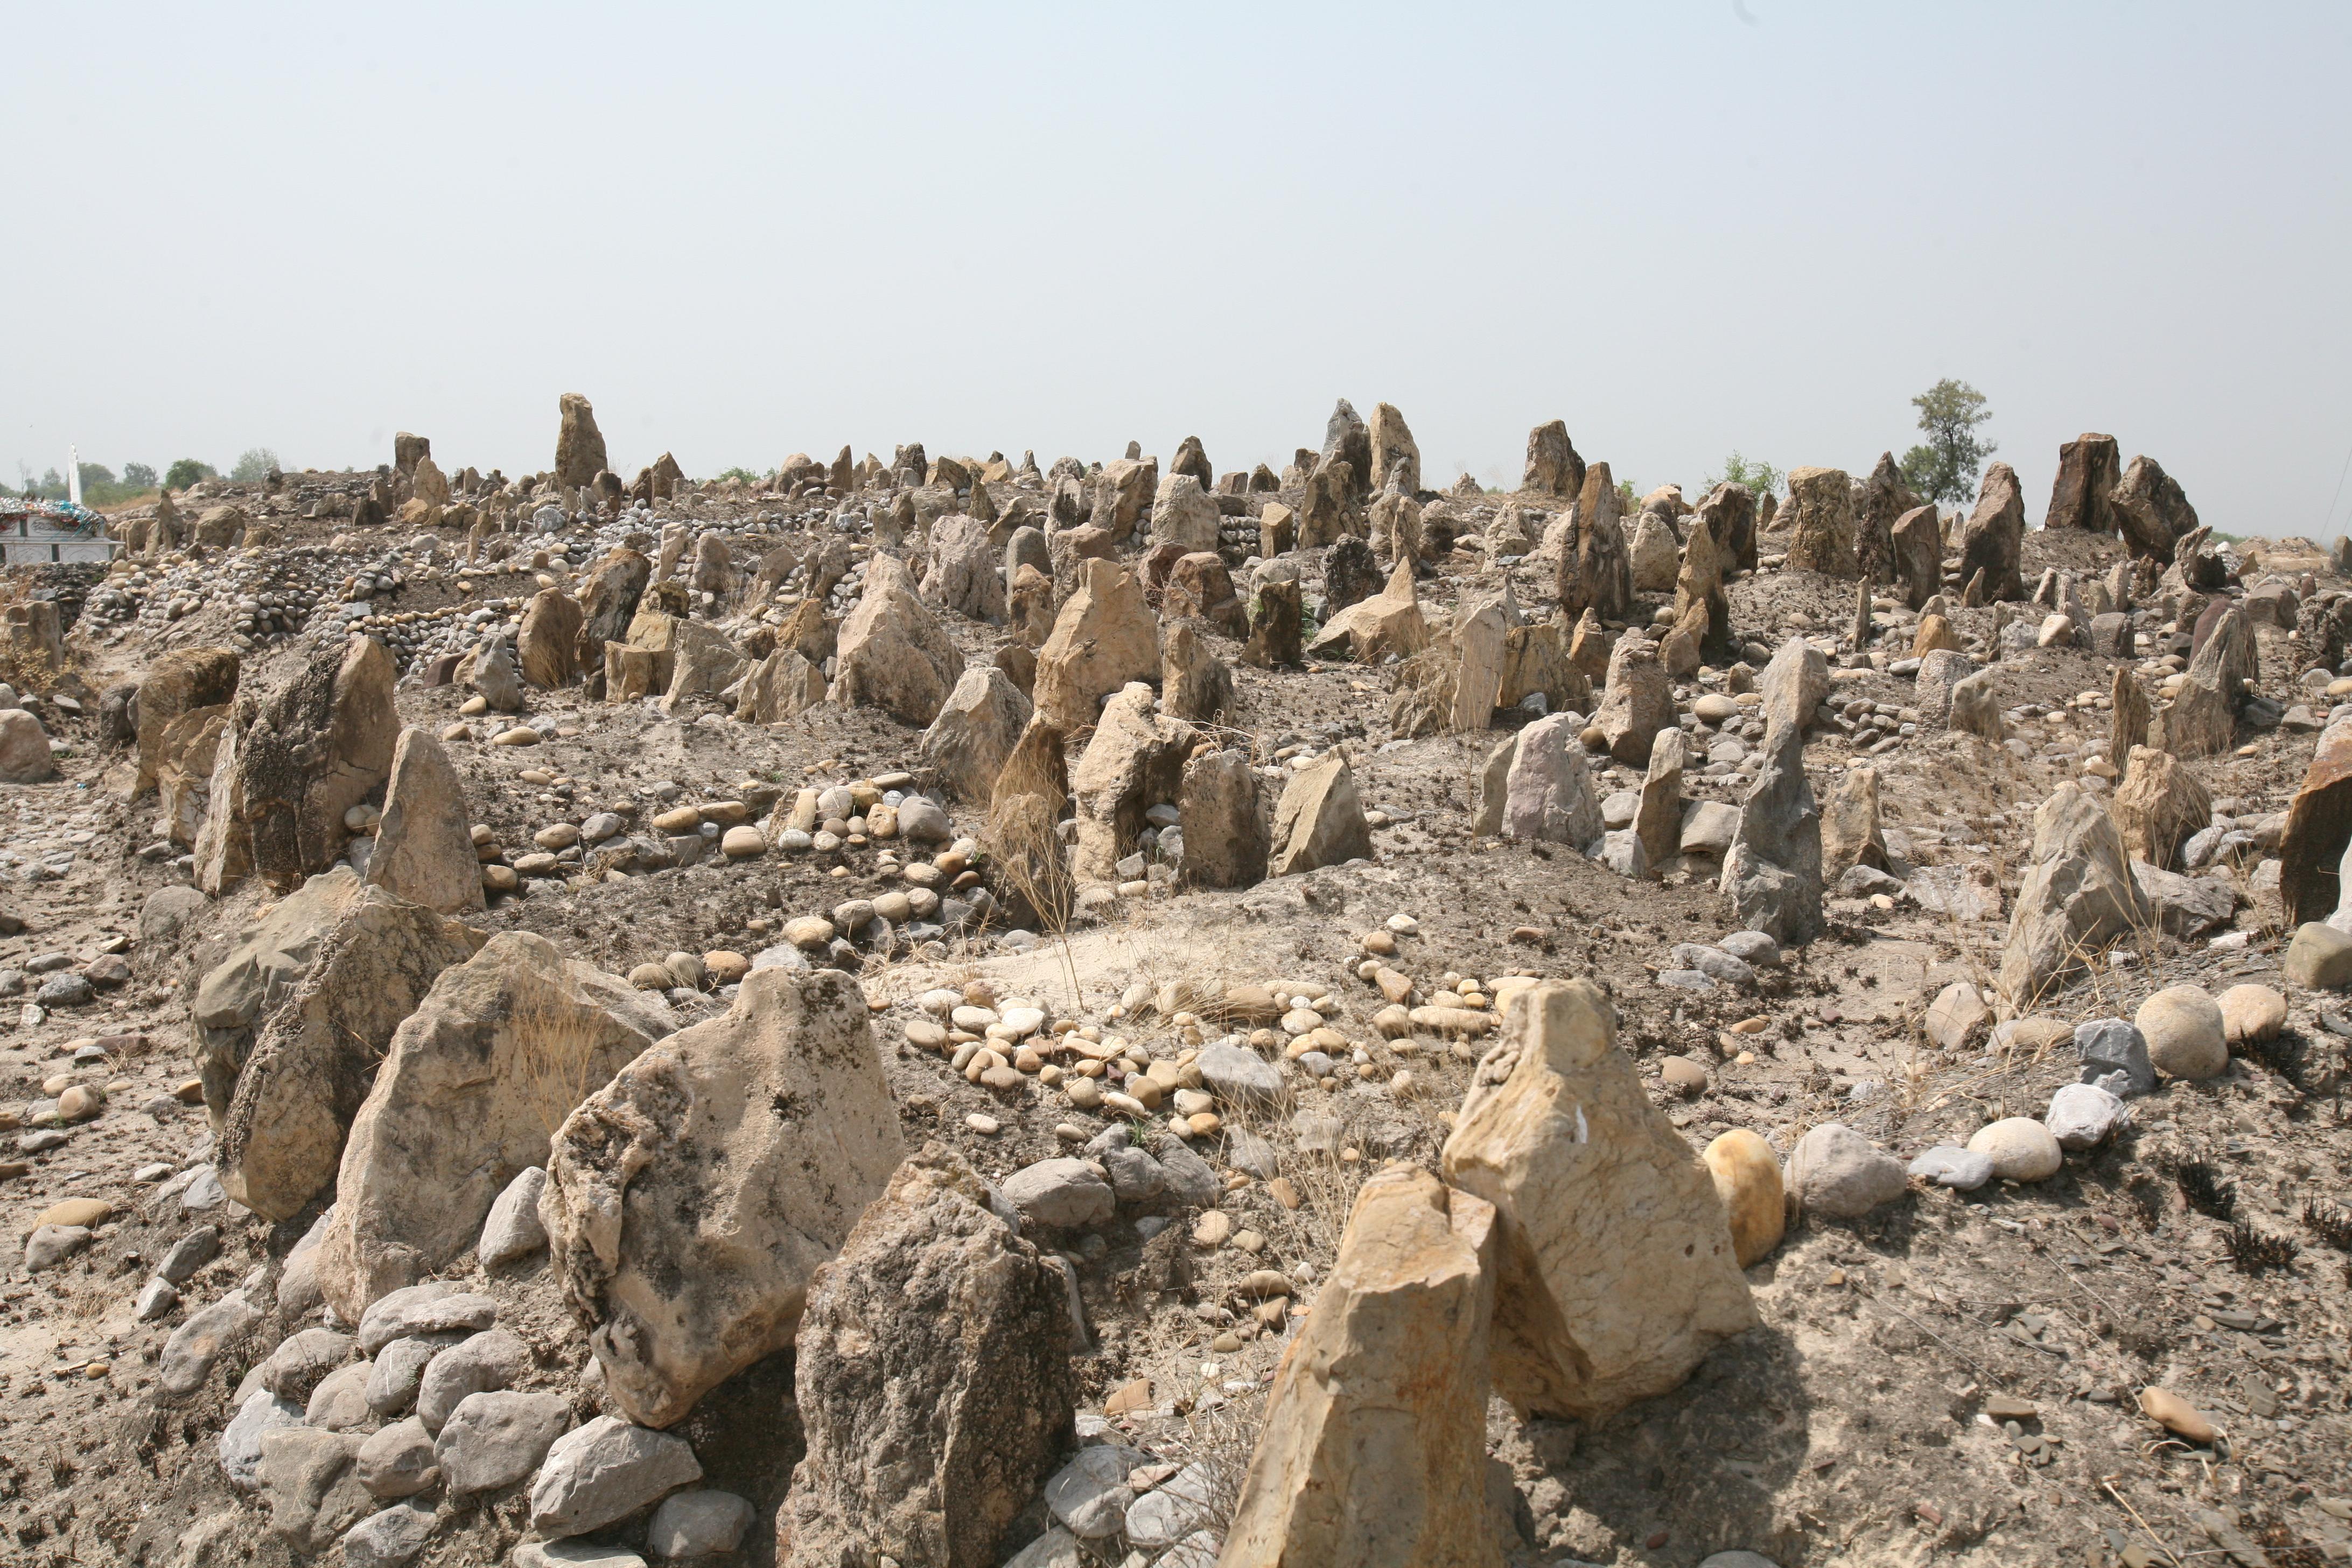 Friedhof afghanischer Flüchtlinge